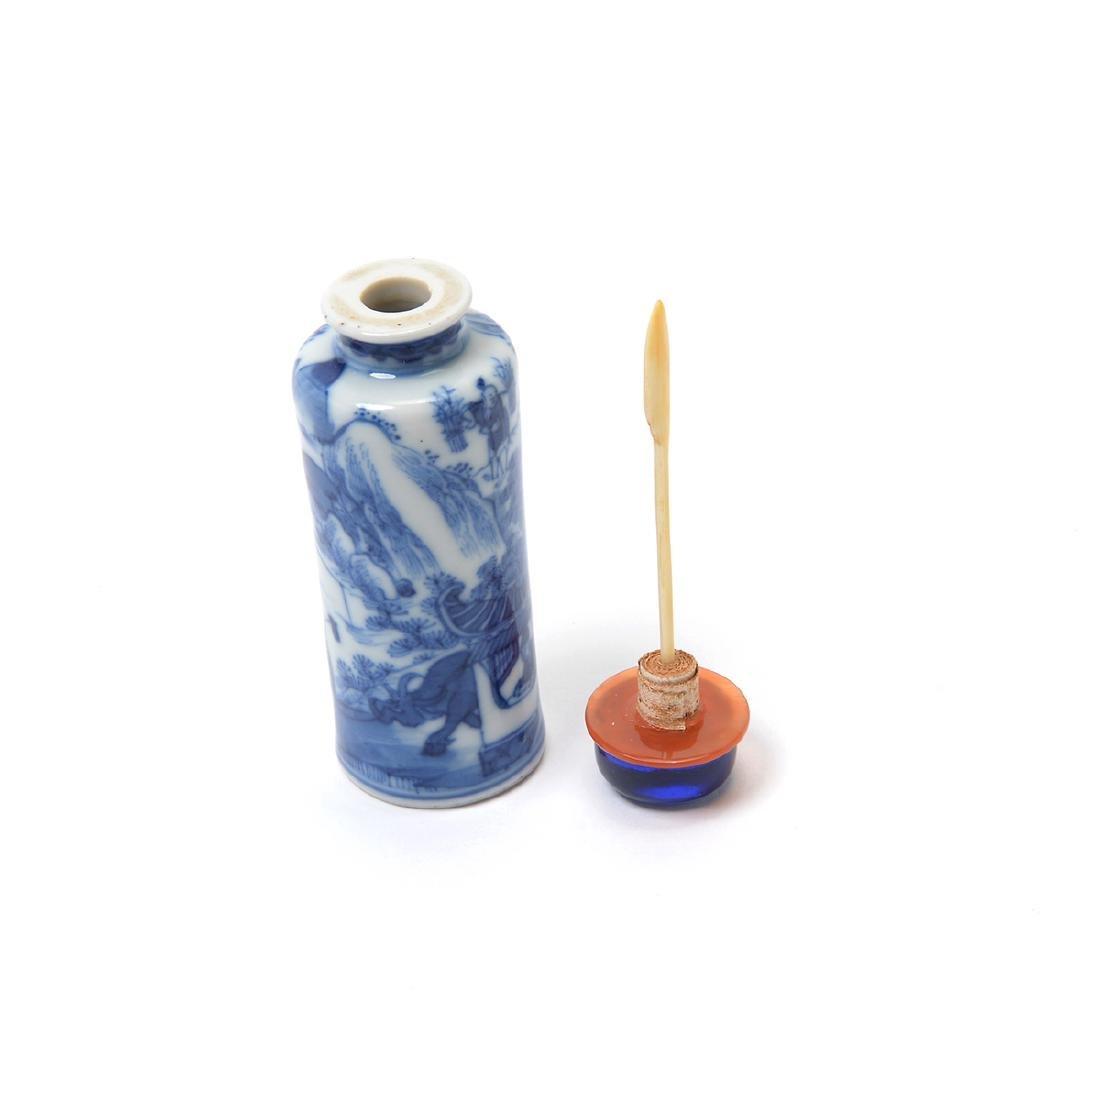 Three Underglaze Blue Porcelain Snuff Bottles, 19th C - 6